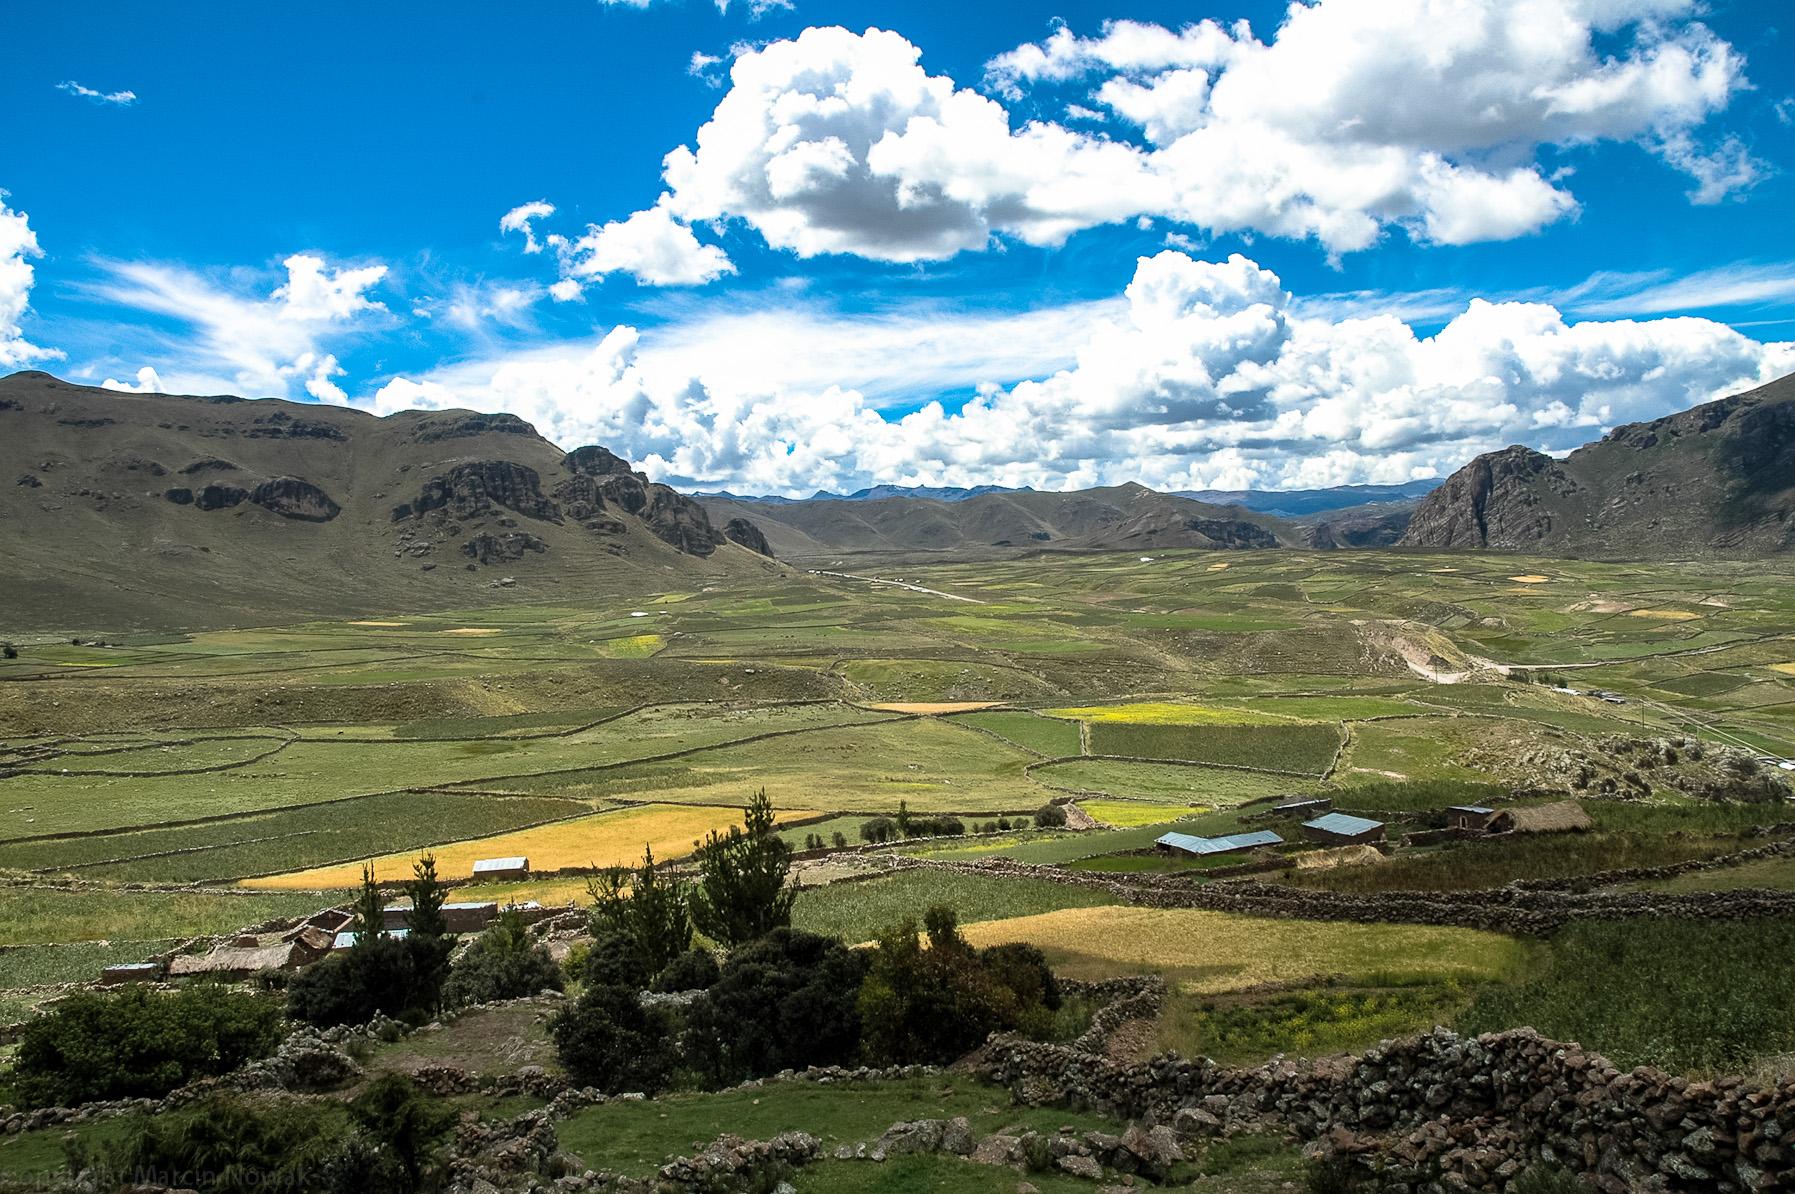 Dolina wioski Tuti